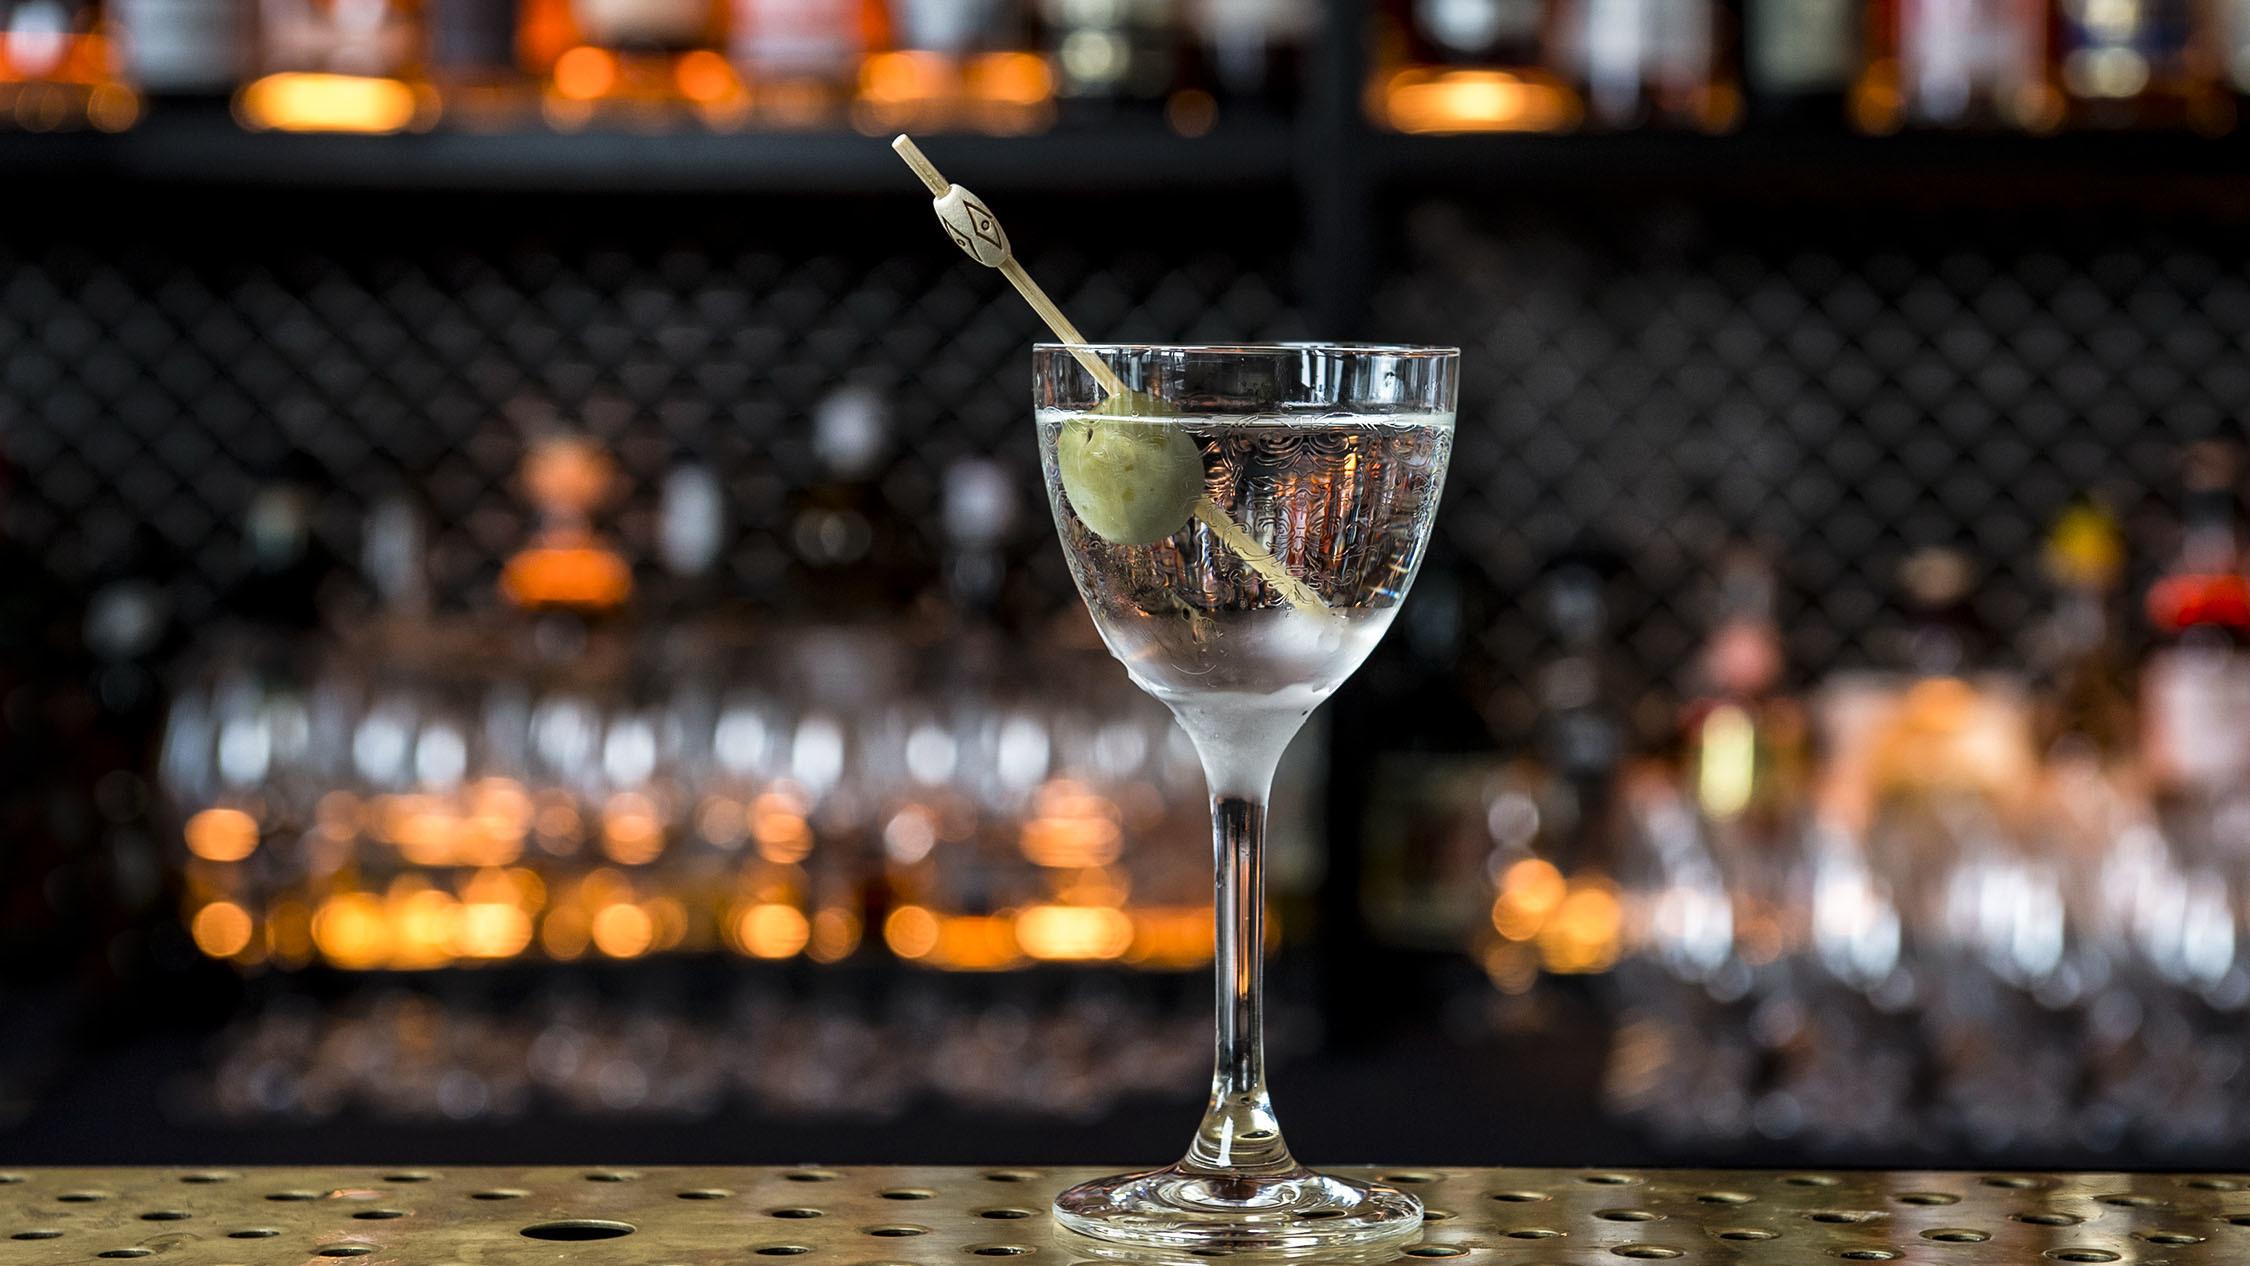 Martini at Nick and Nora's